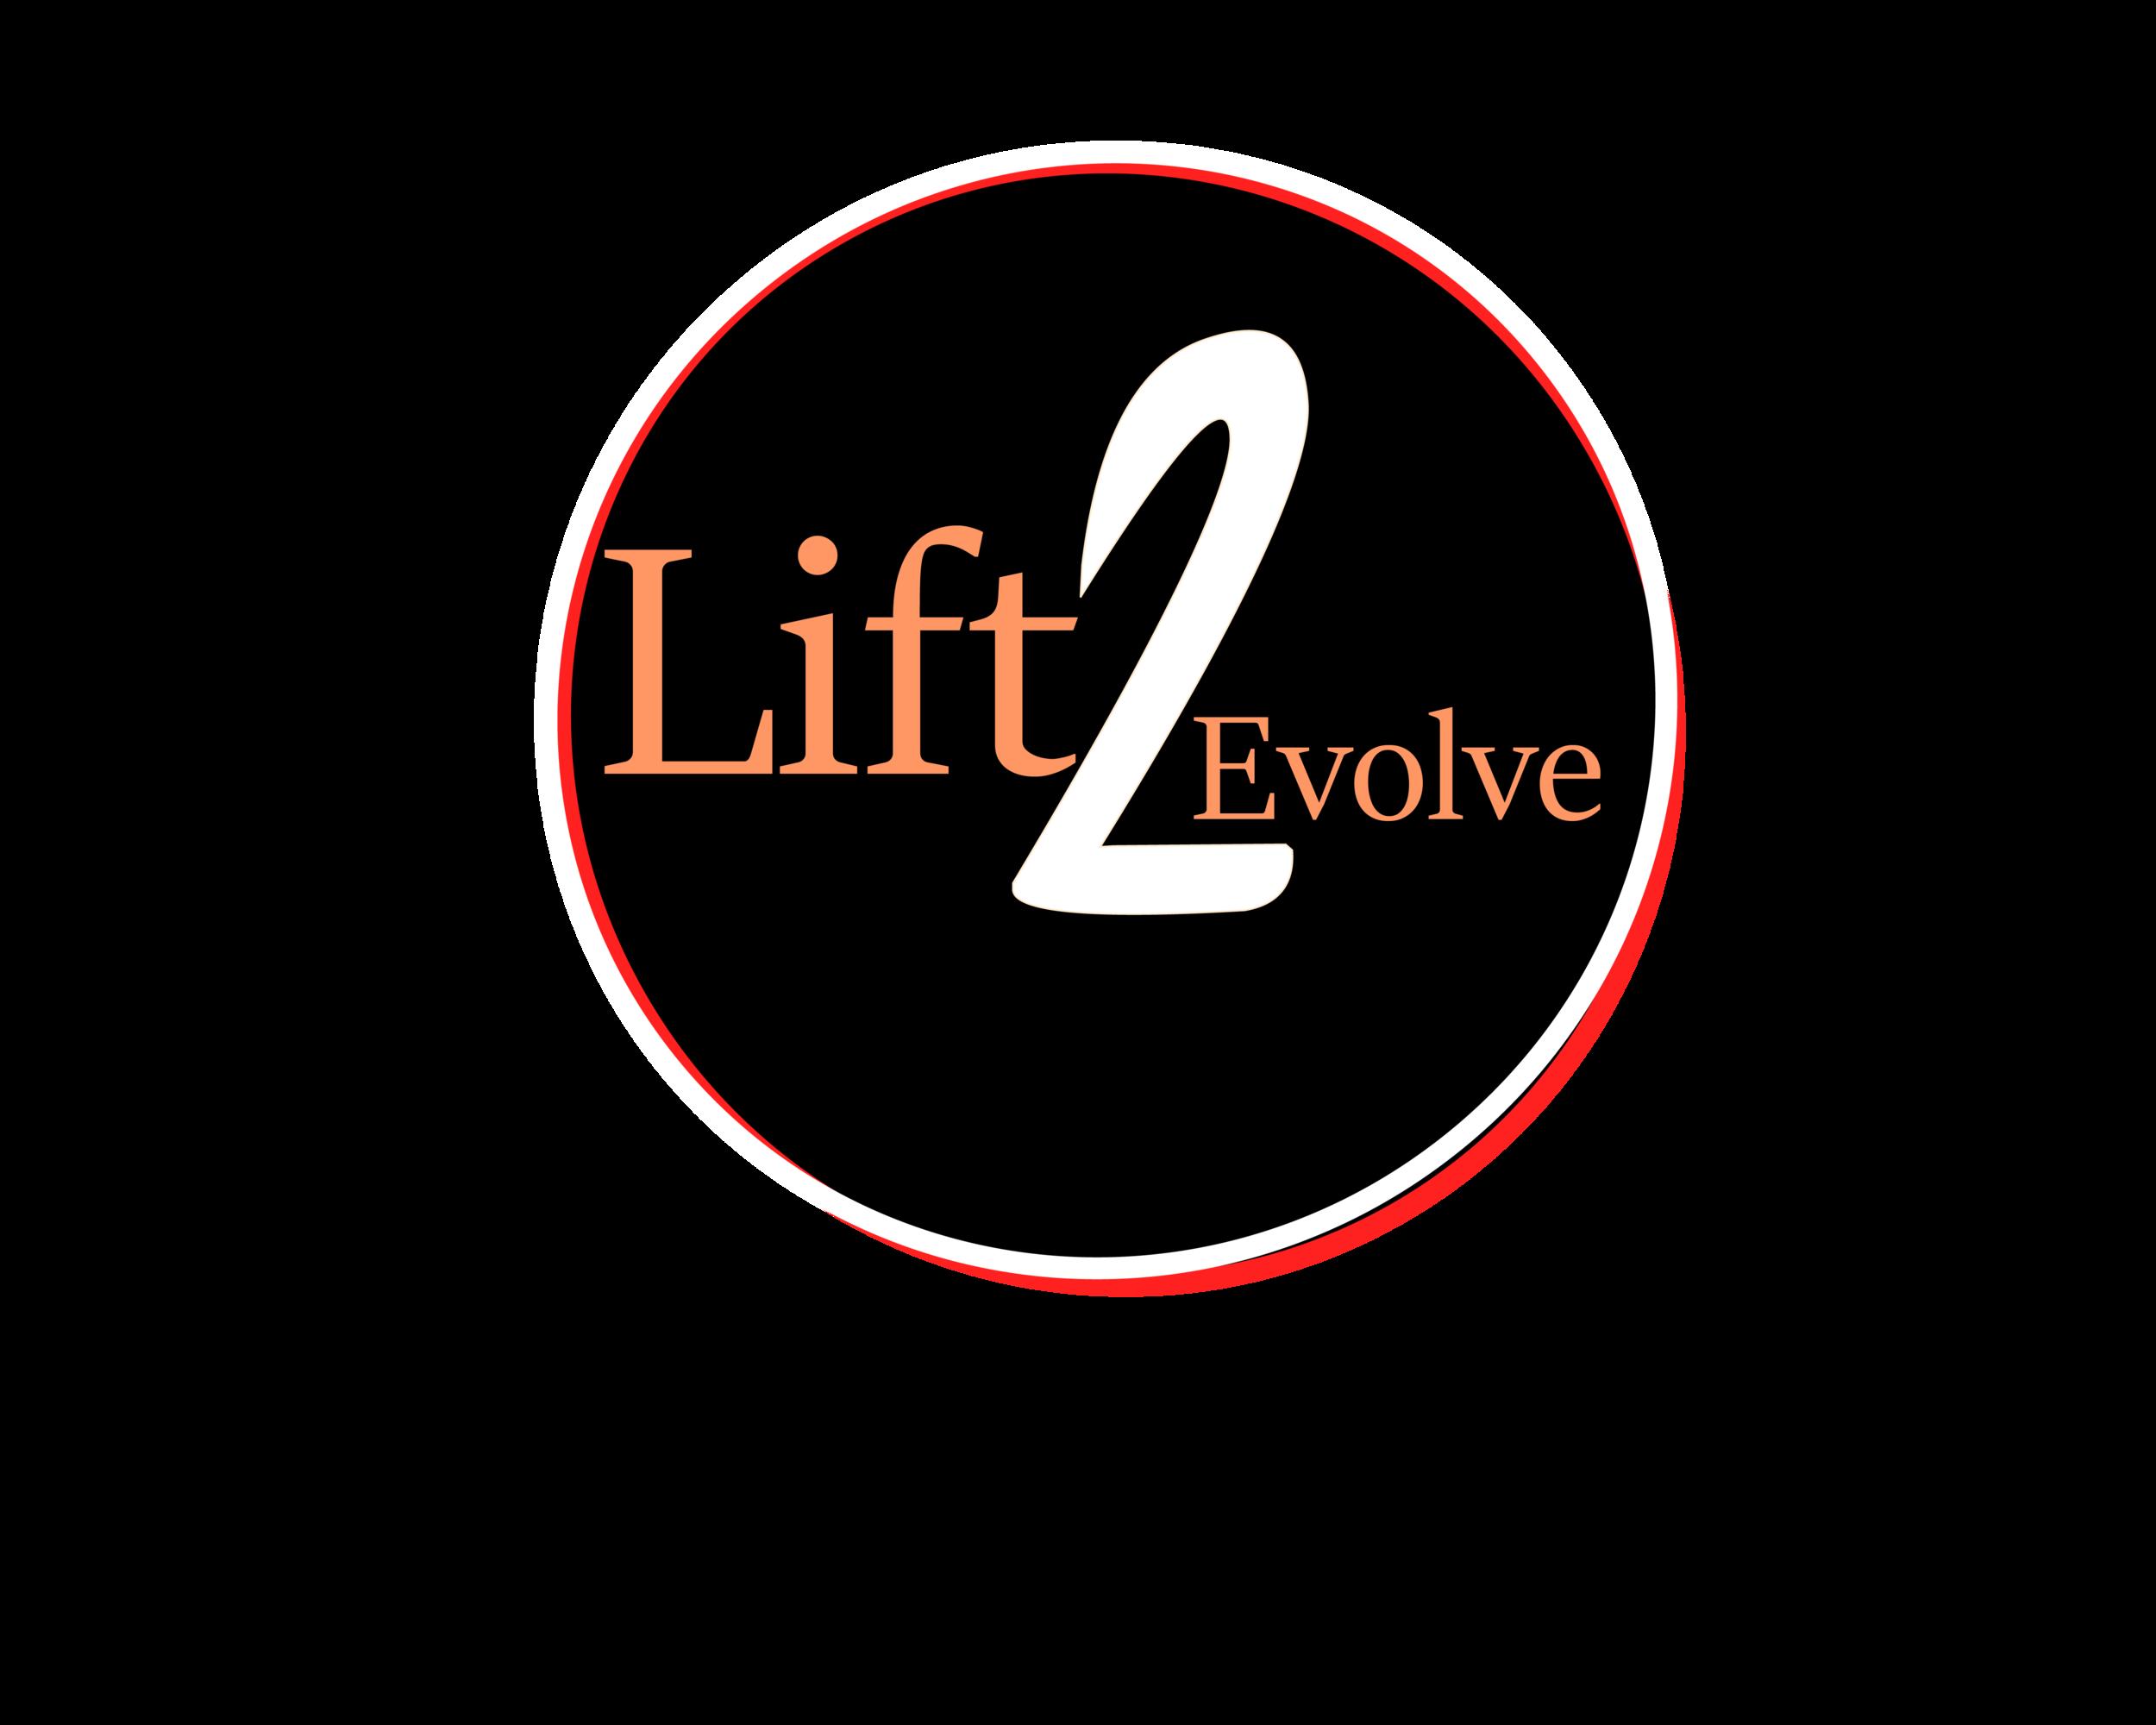 LIFT TO EVOLVE